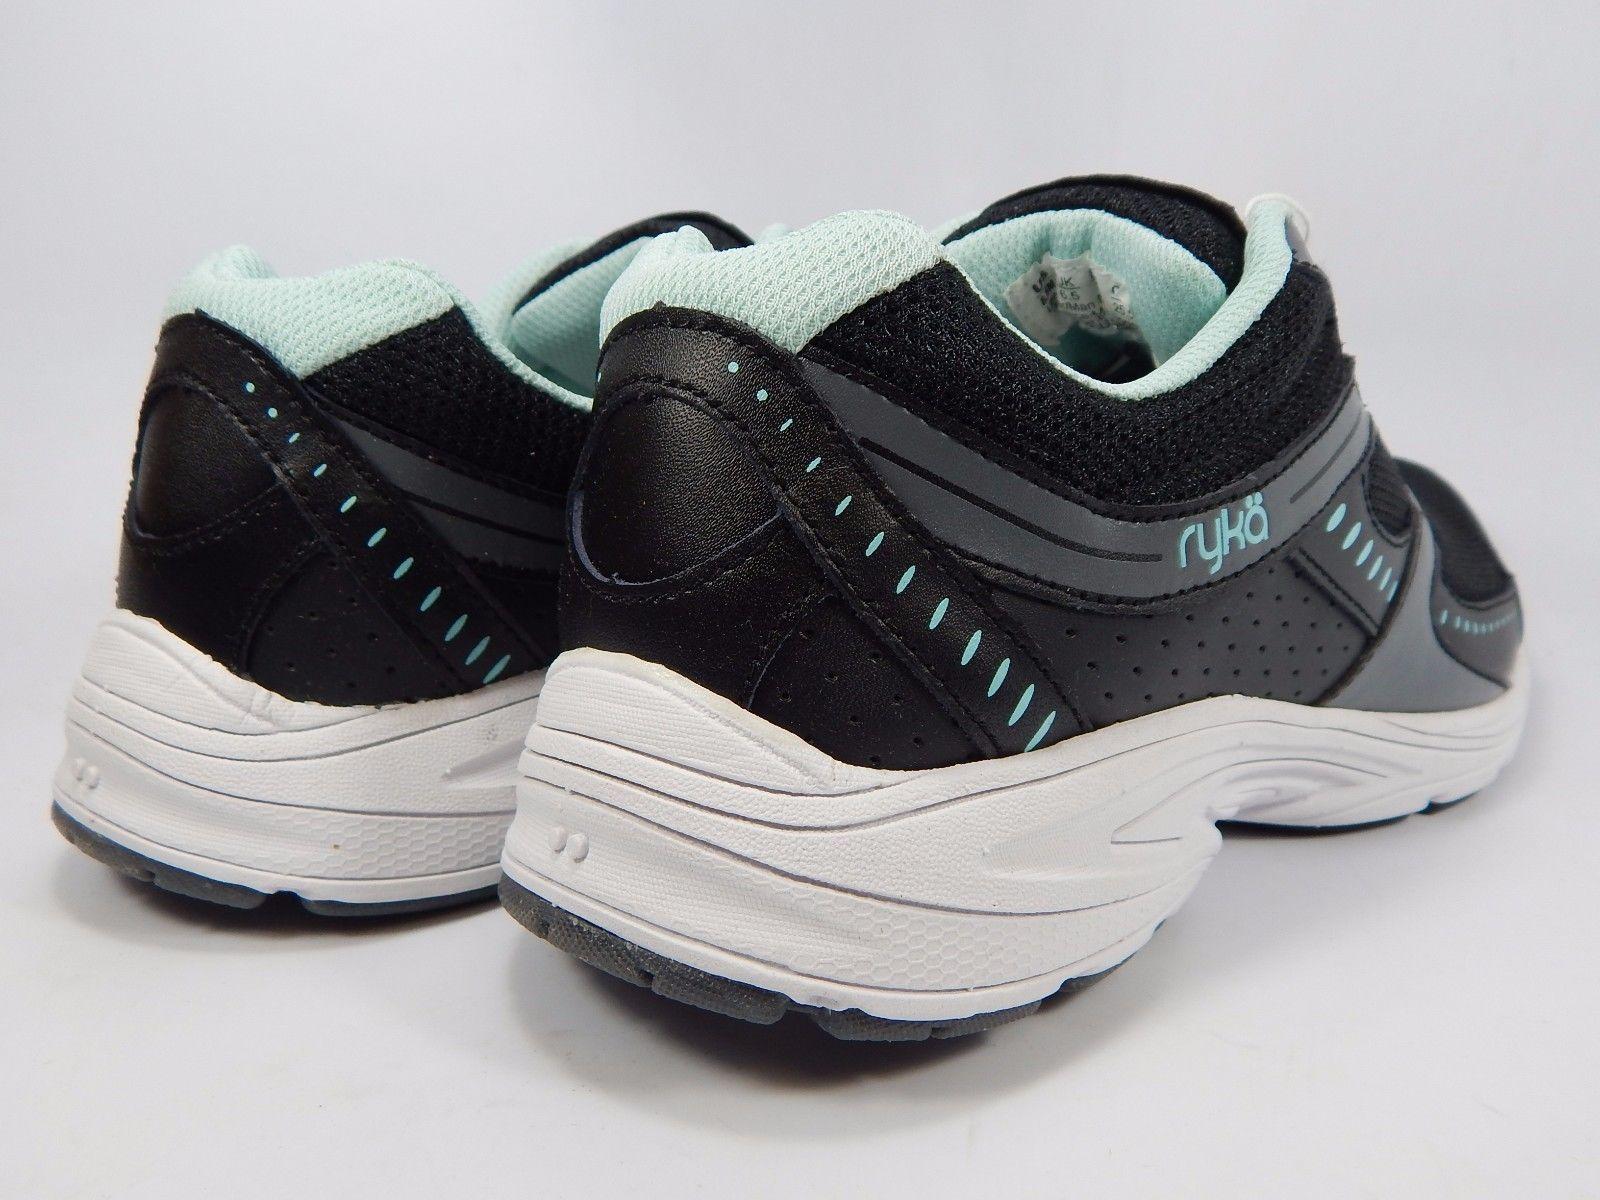 Ryka Circuit SMT Women's Running Shoes Size US 8 M (B) EU 39 Black Aqua Blue